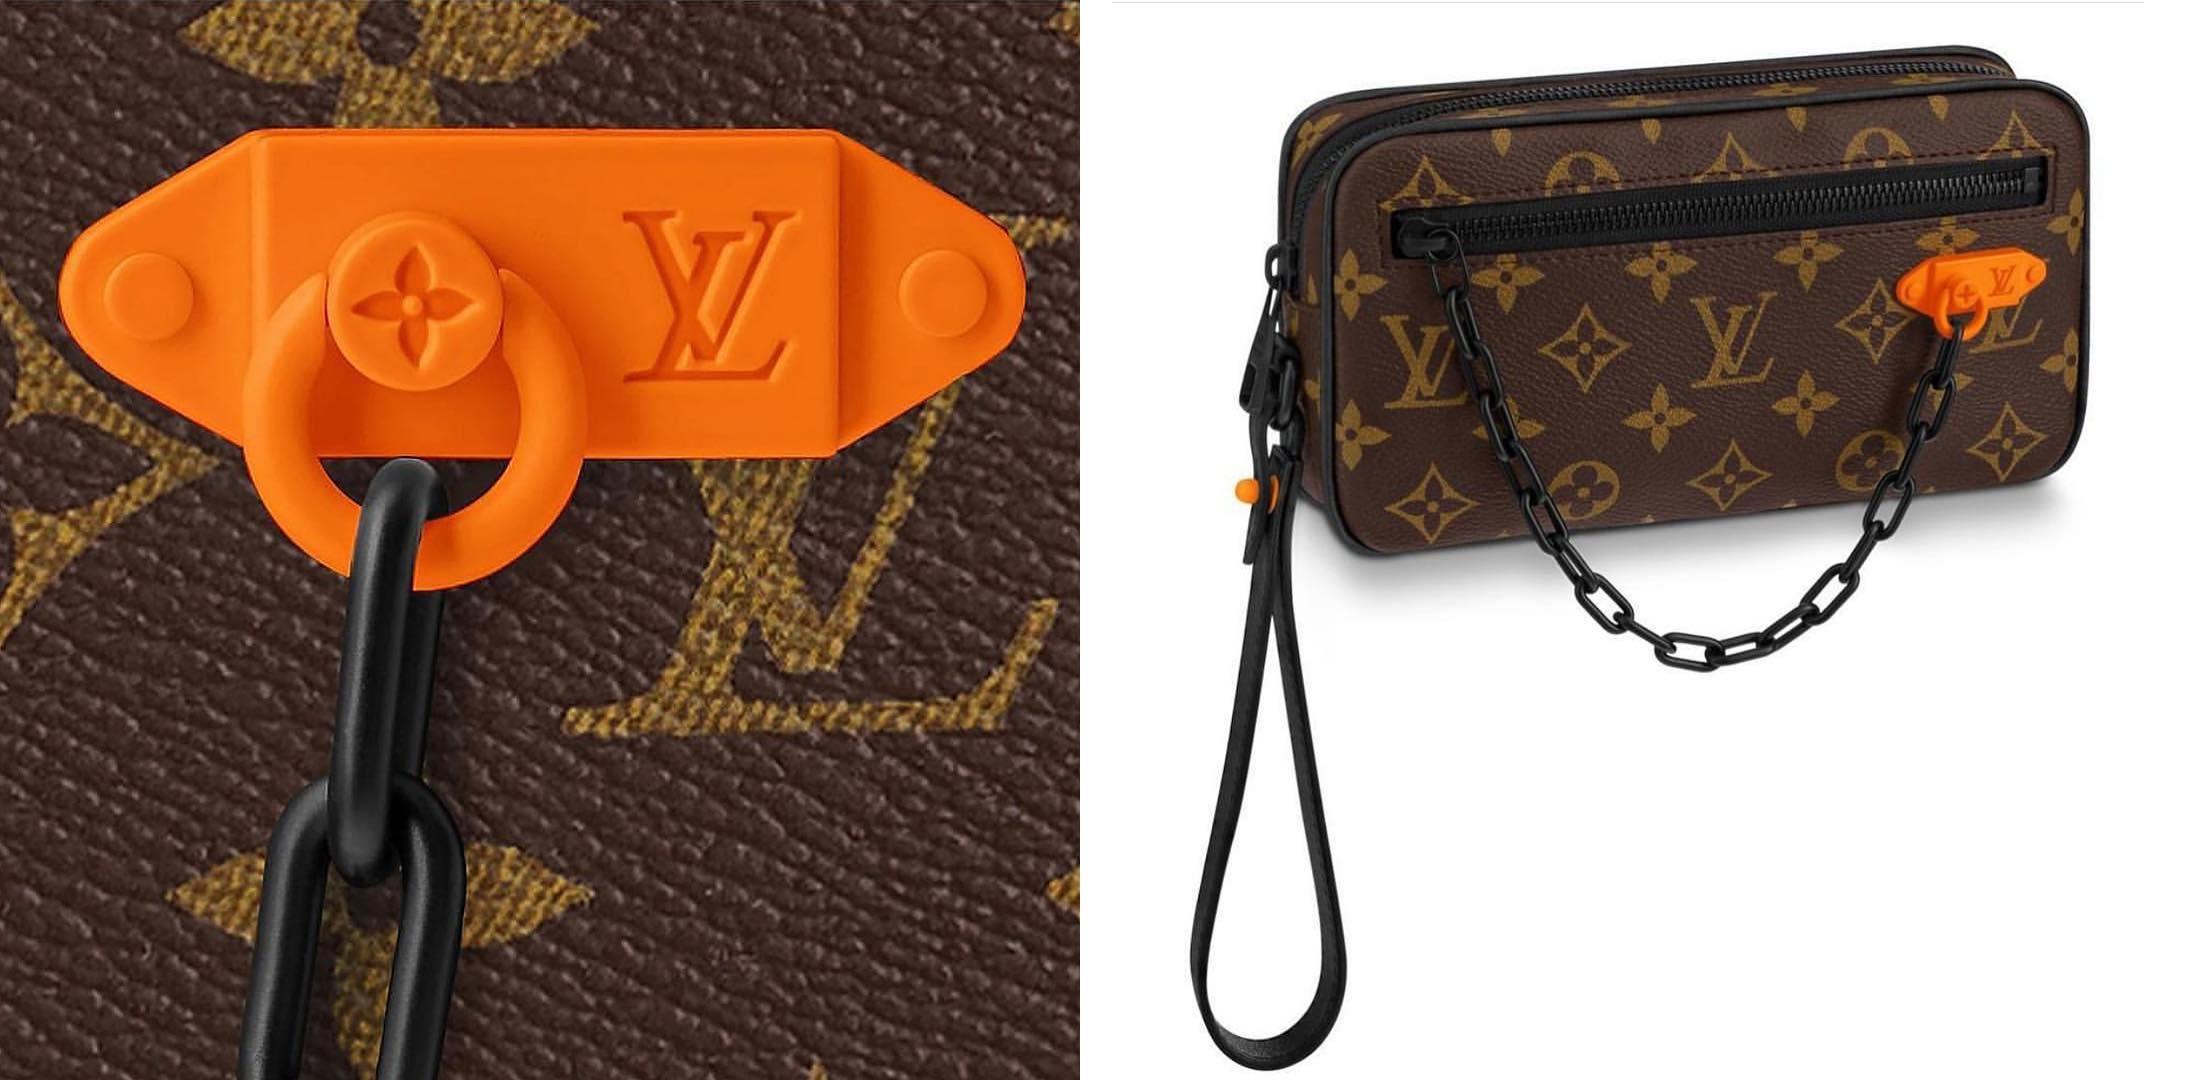 Virgil Abloh Shares a Closer Look at a Men's Louis Vuitton Signature Bag